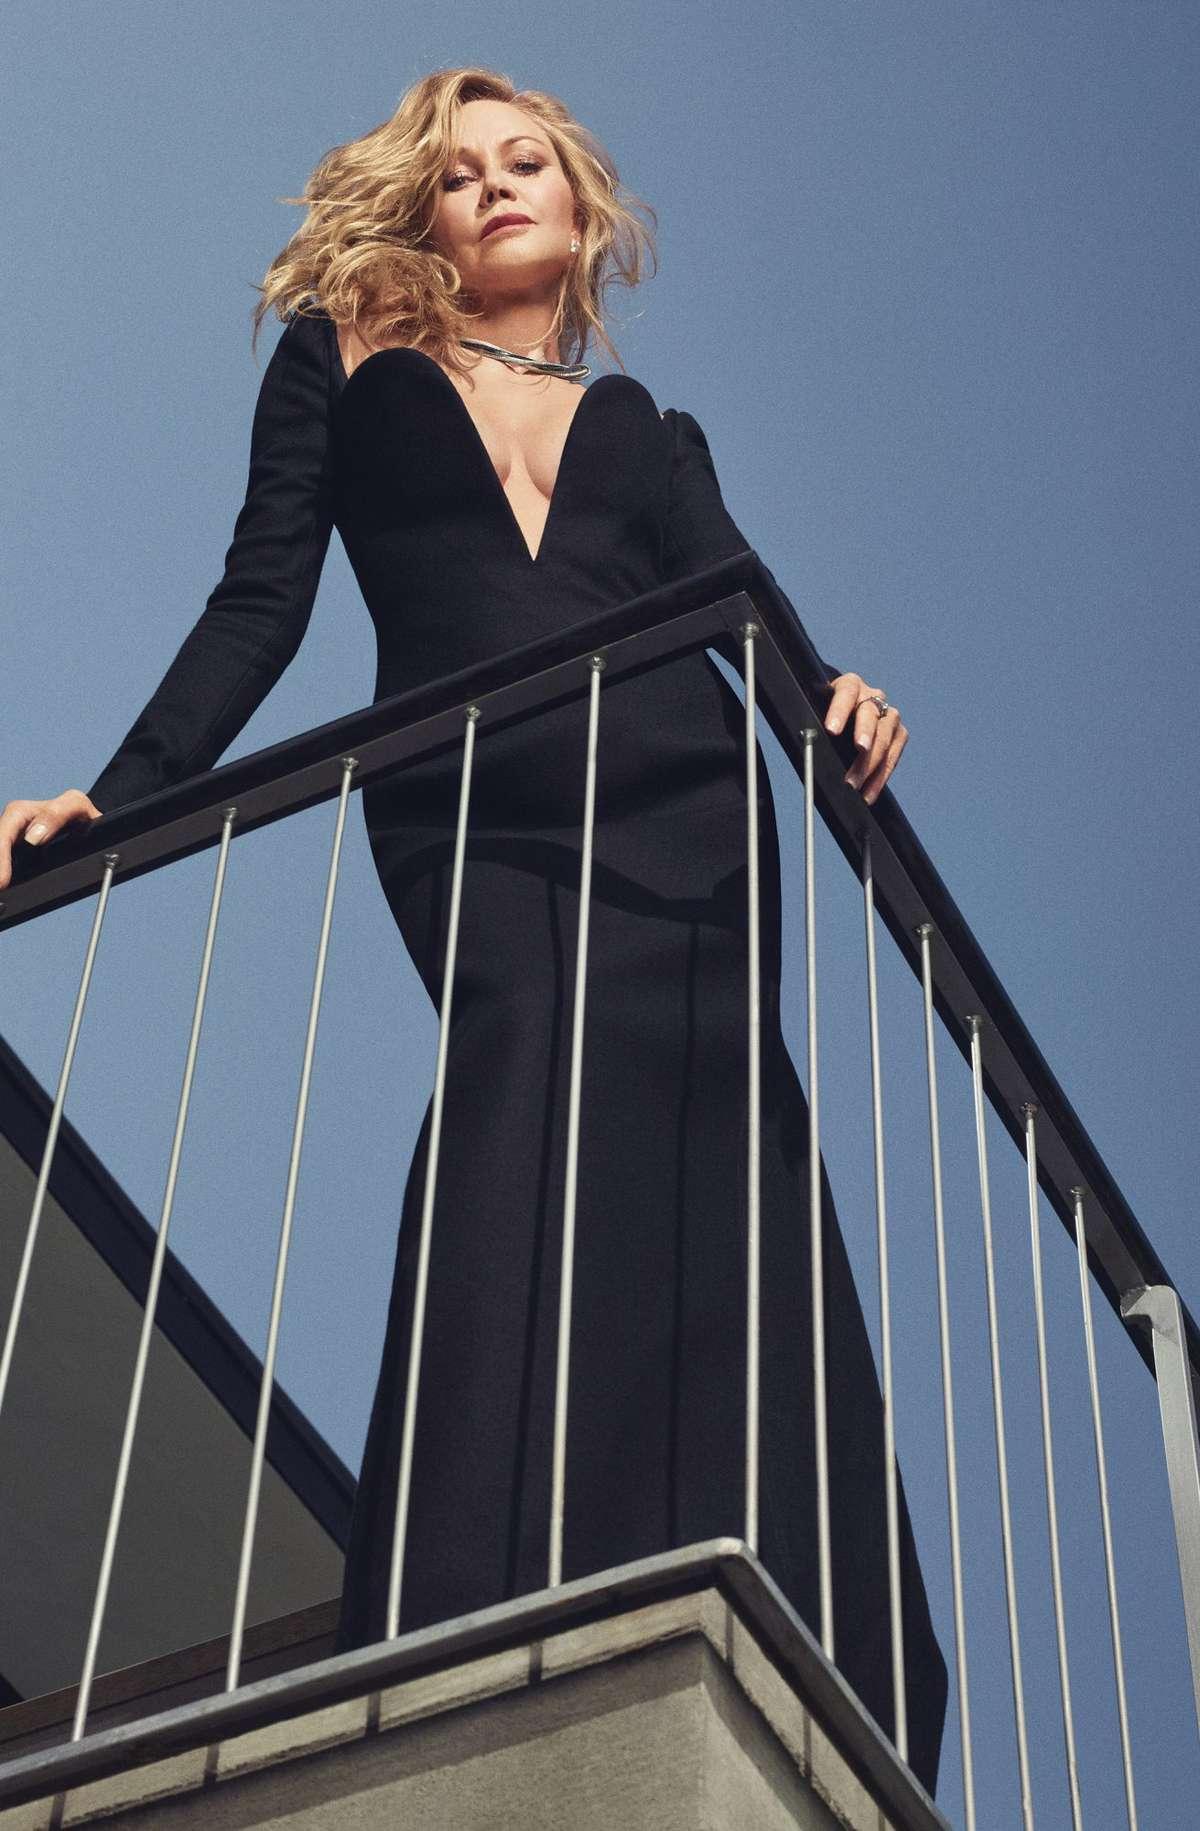 Melanie Griffith Ass photo 10